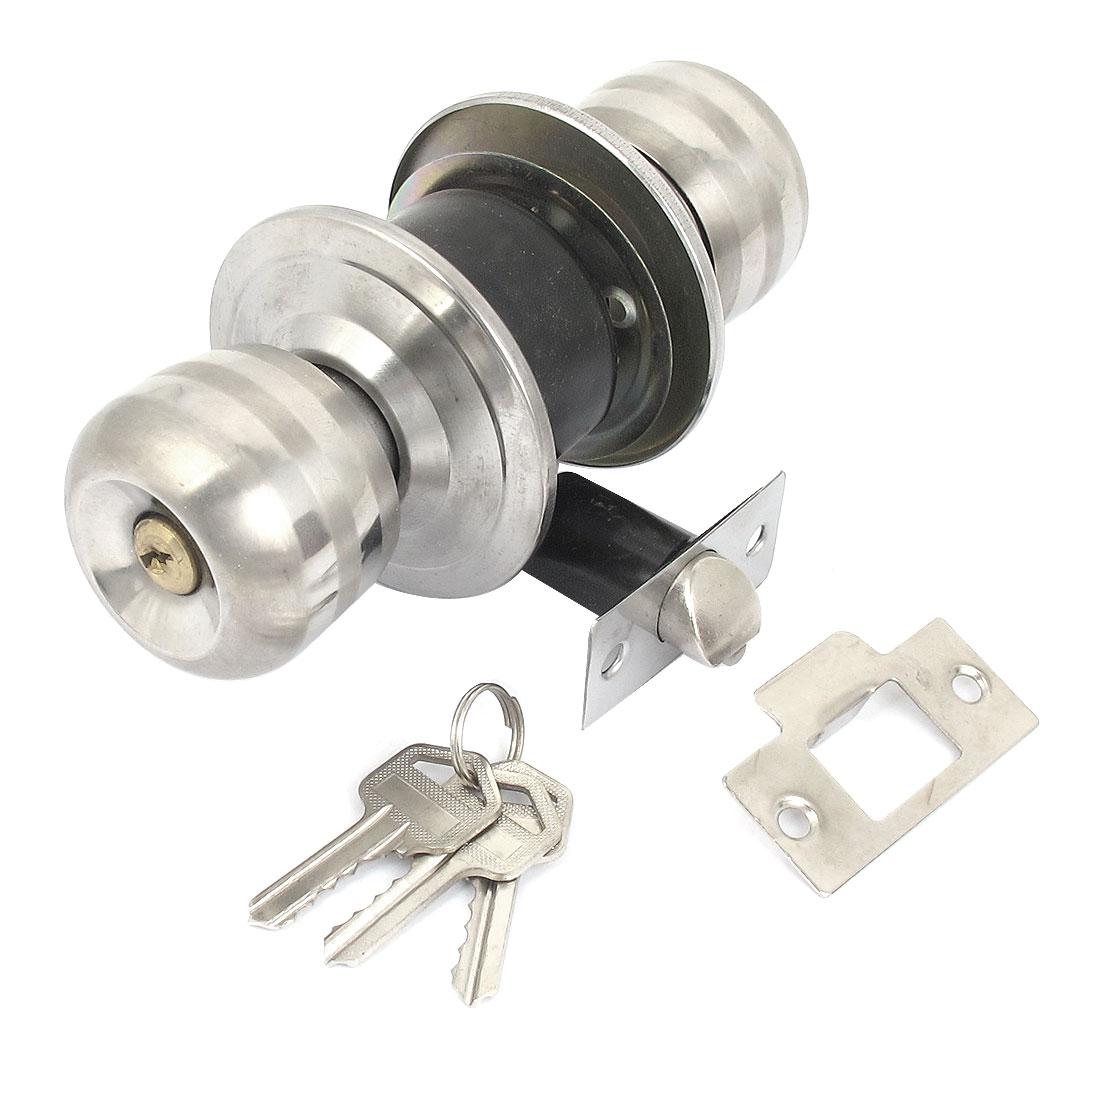 Home Office Door Cylinder Deadbolts Ball Knob Locking Latch Silver Tone w 3 Keys